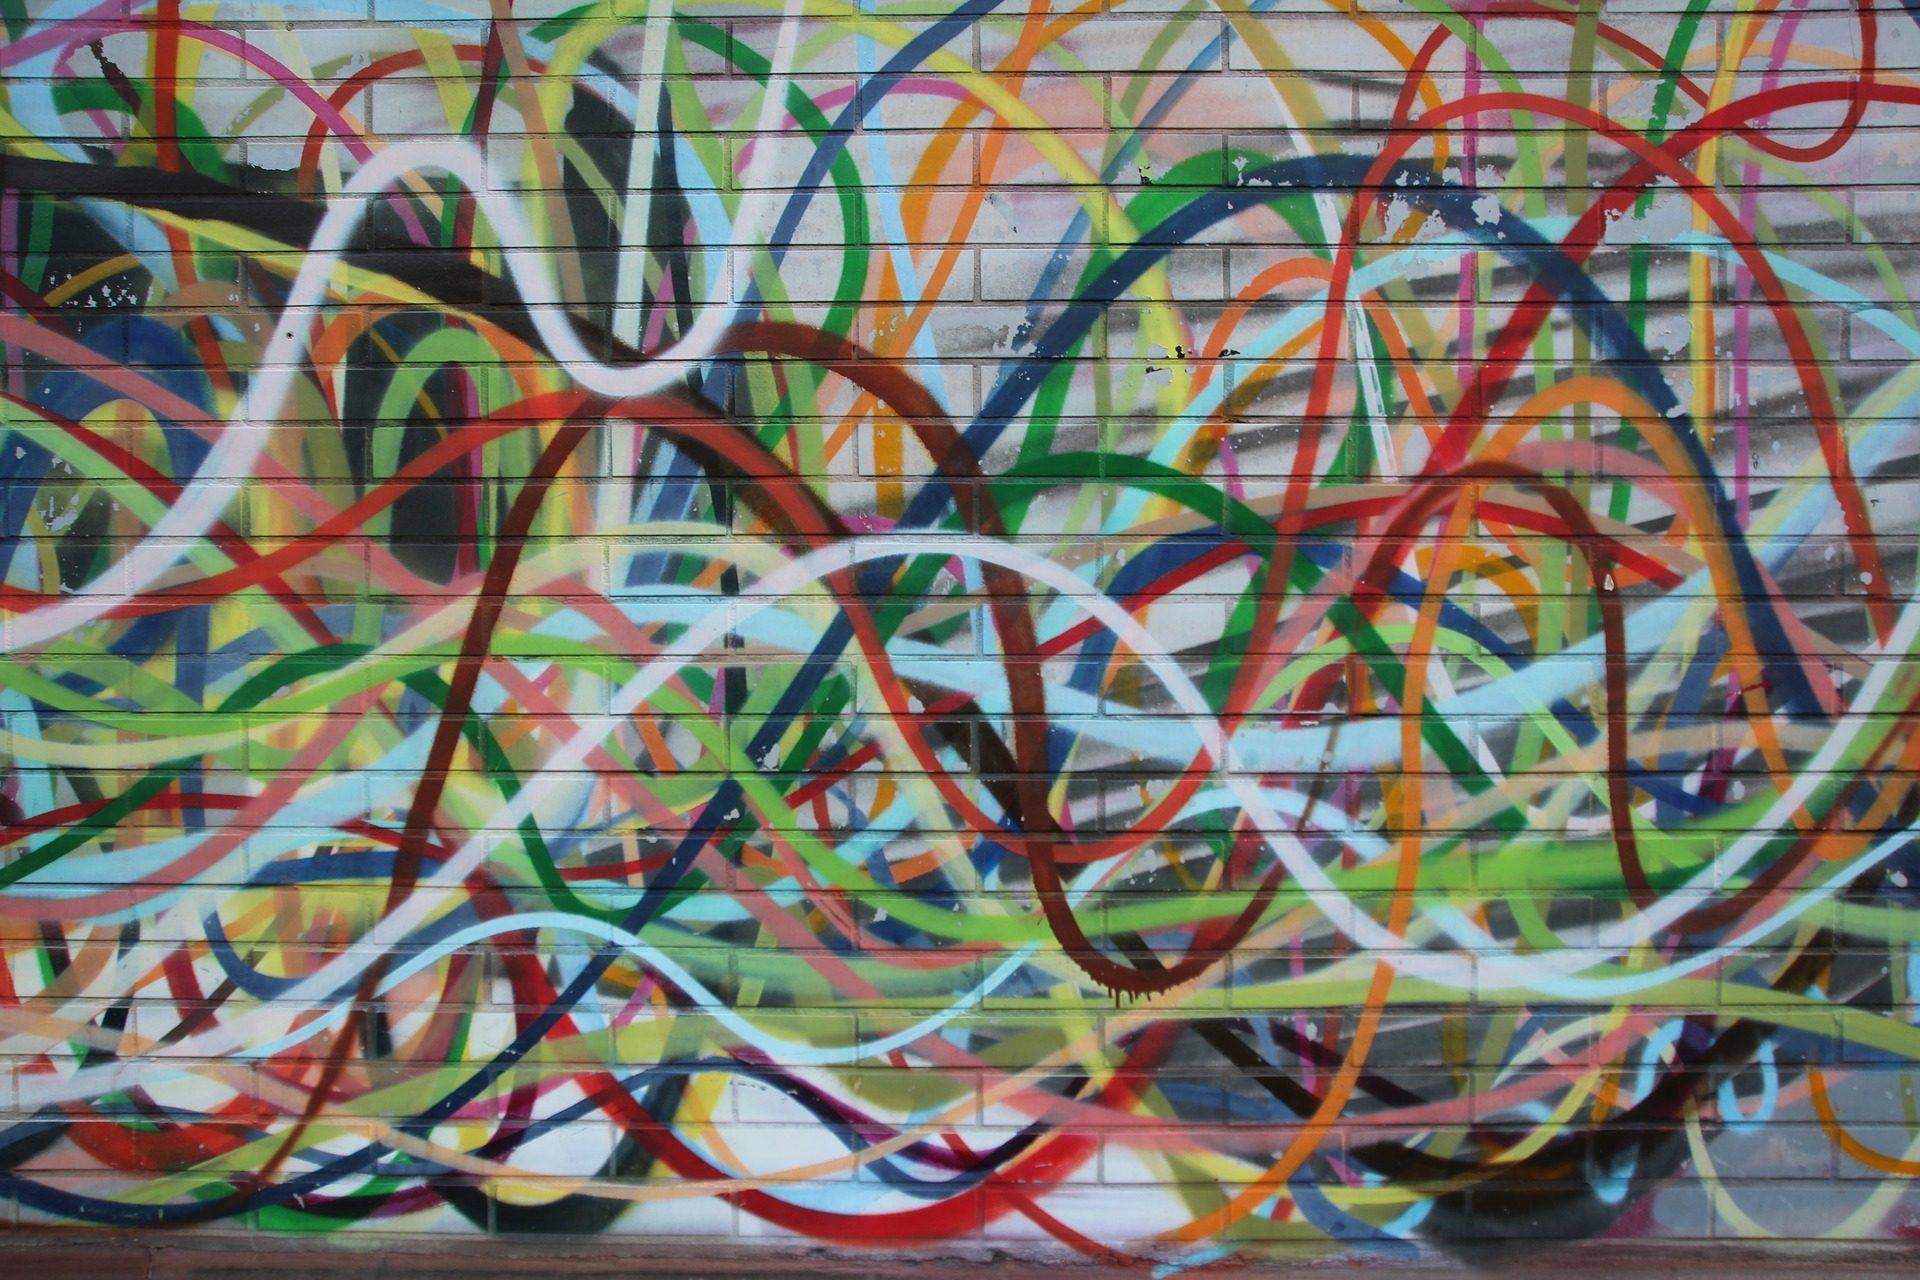 Graffiti, lignes, Stripes, peint, peinture murale, Mur - Fonds d'écran HD - Professor-falken.com